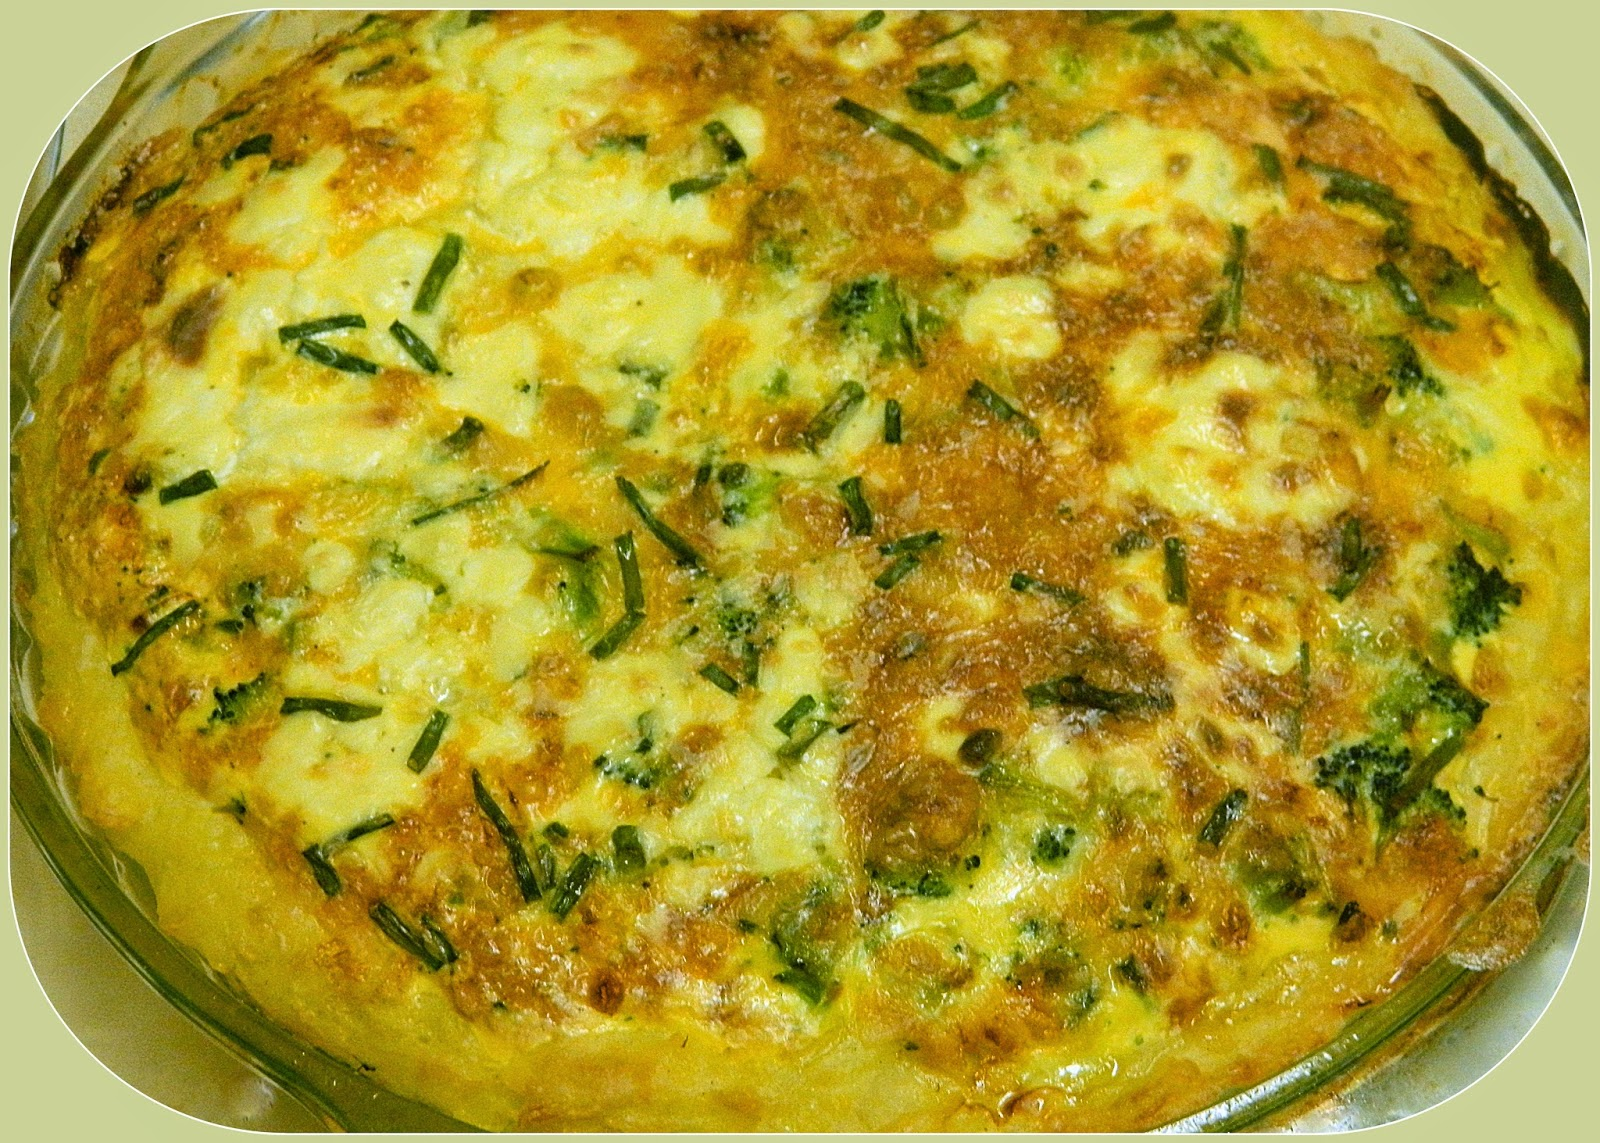 Ina Garten Broccoli Quiche Recipes Ina Garten Broccoli Quiche Recipe